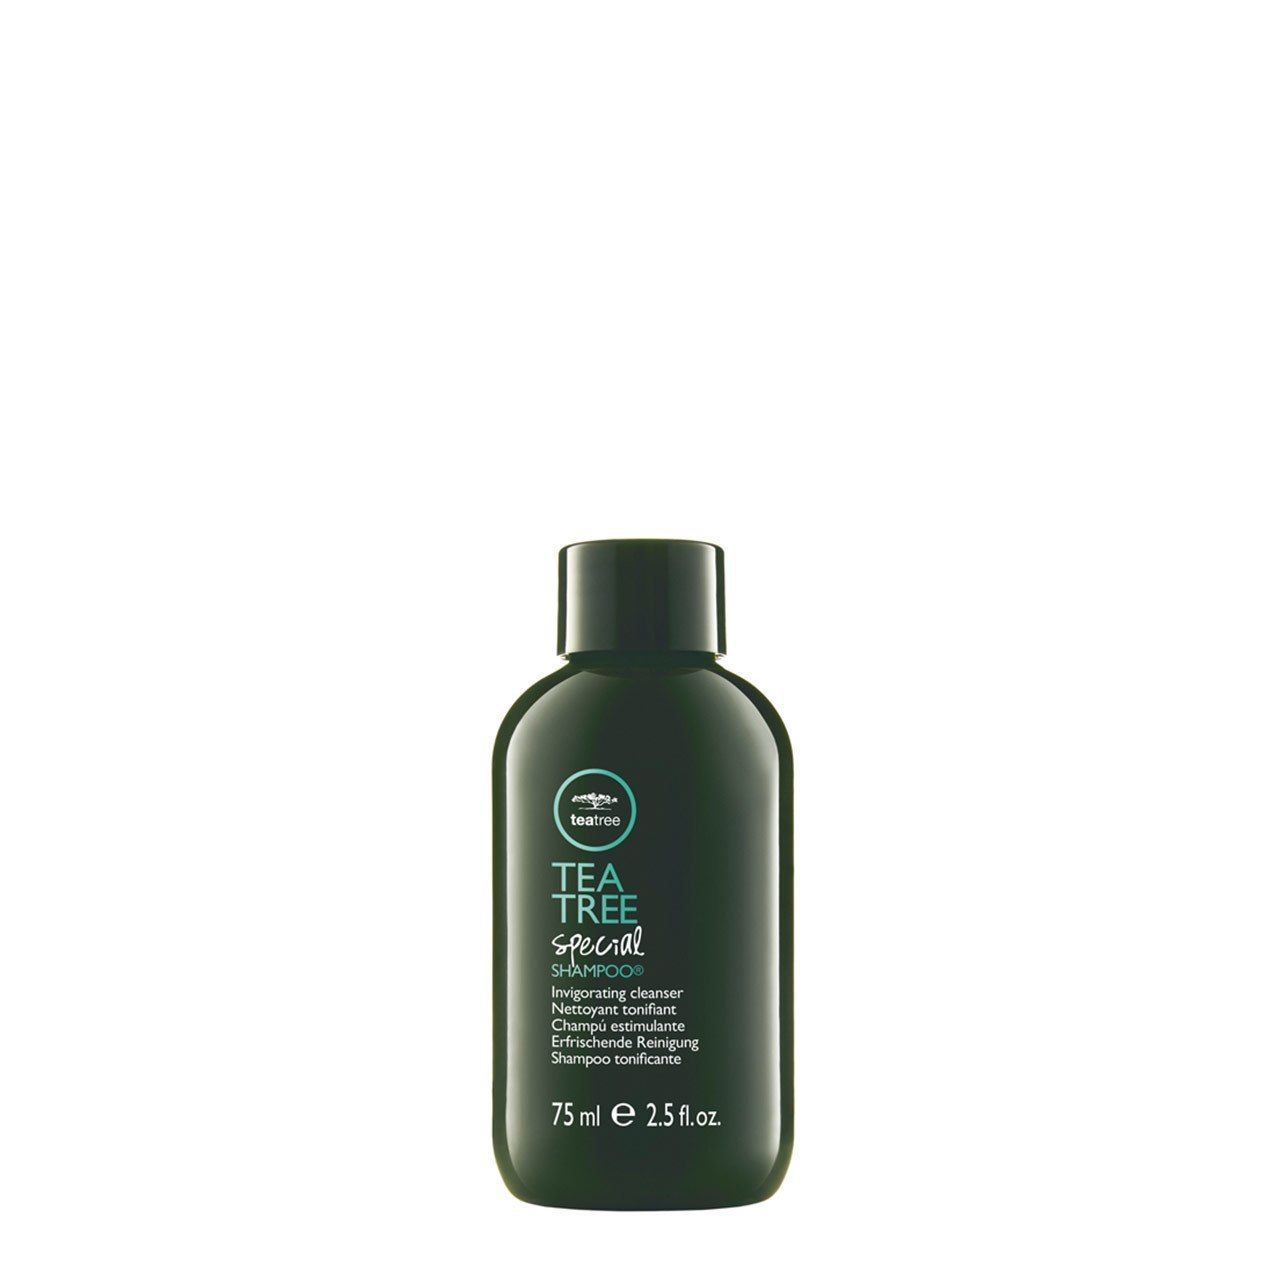 Paul Mitchell Tea Tree Special Shampoo - 75ml